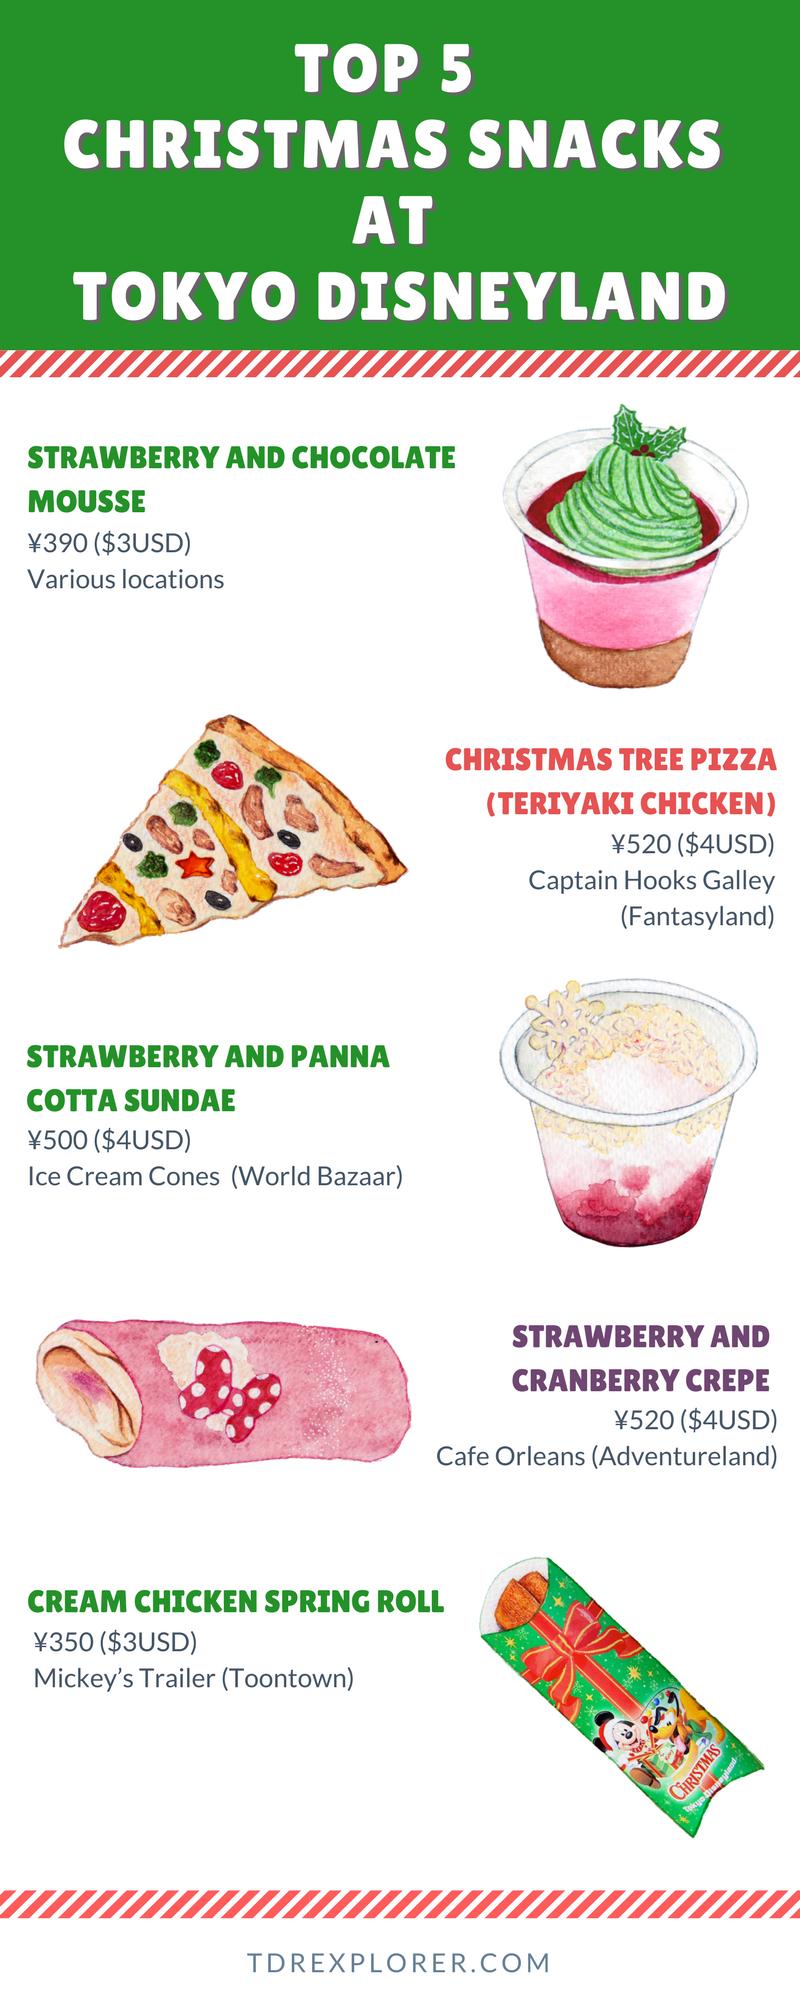 Top 10 Christmas Snacks At Tokyo Disneyland Tokyo Disneyland Christmas Snacks Disneyland